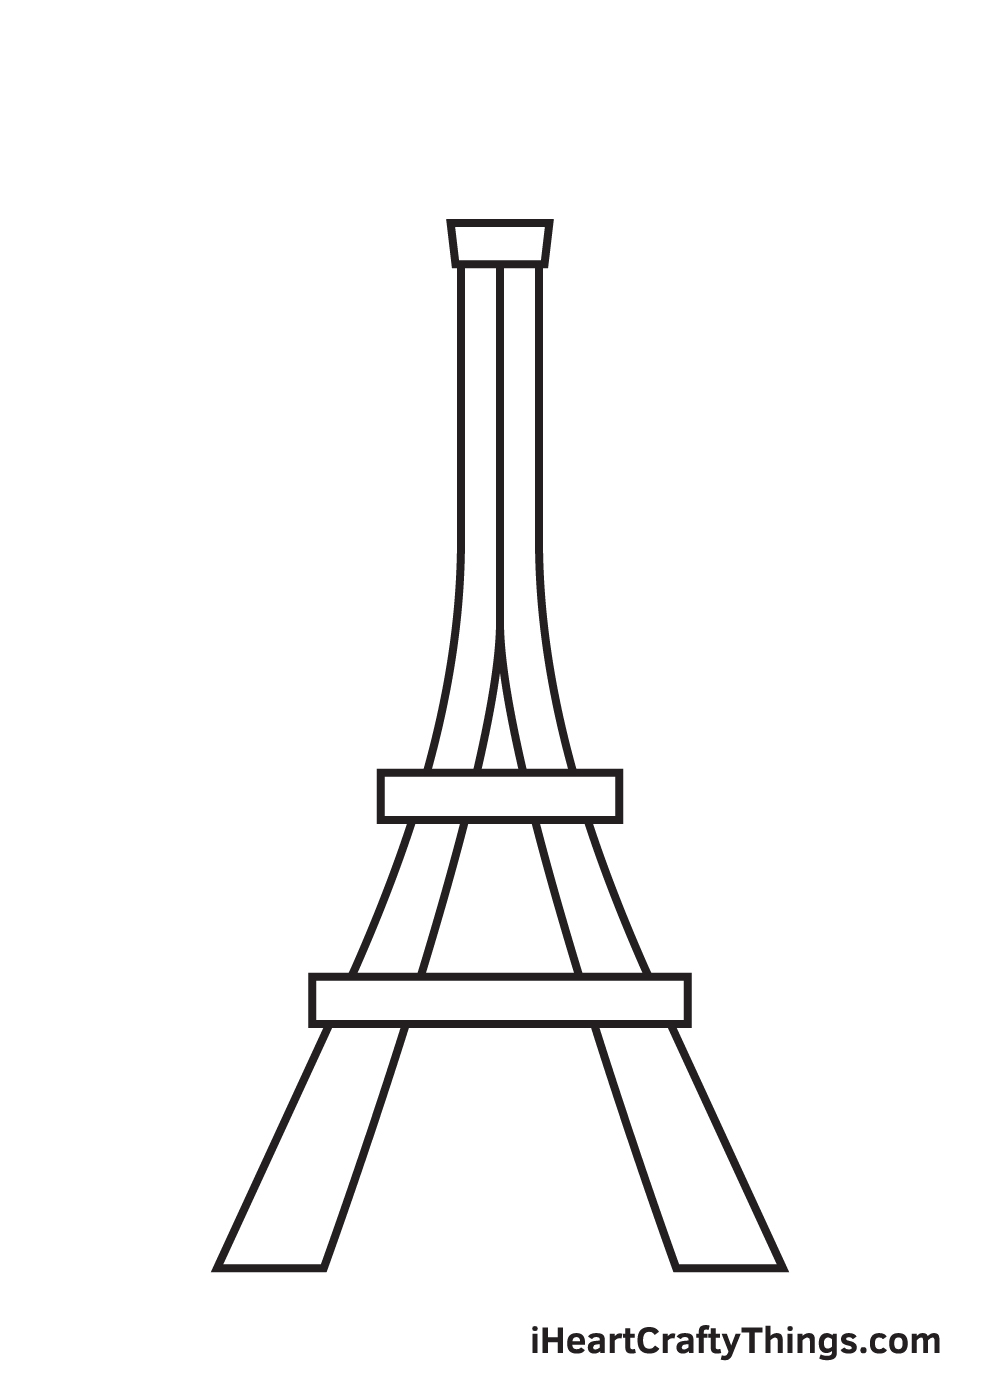 Eiffel Tower drawing - step 4